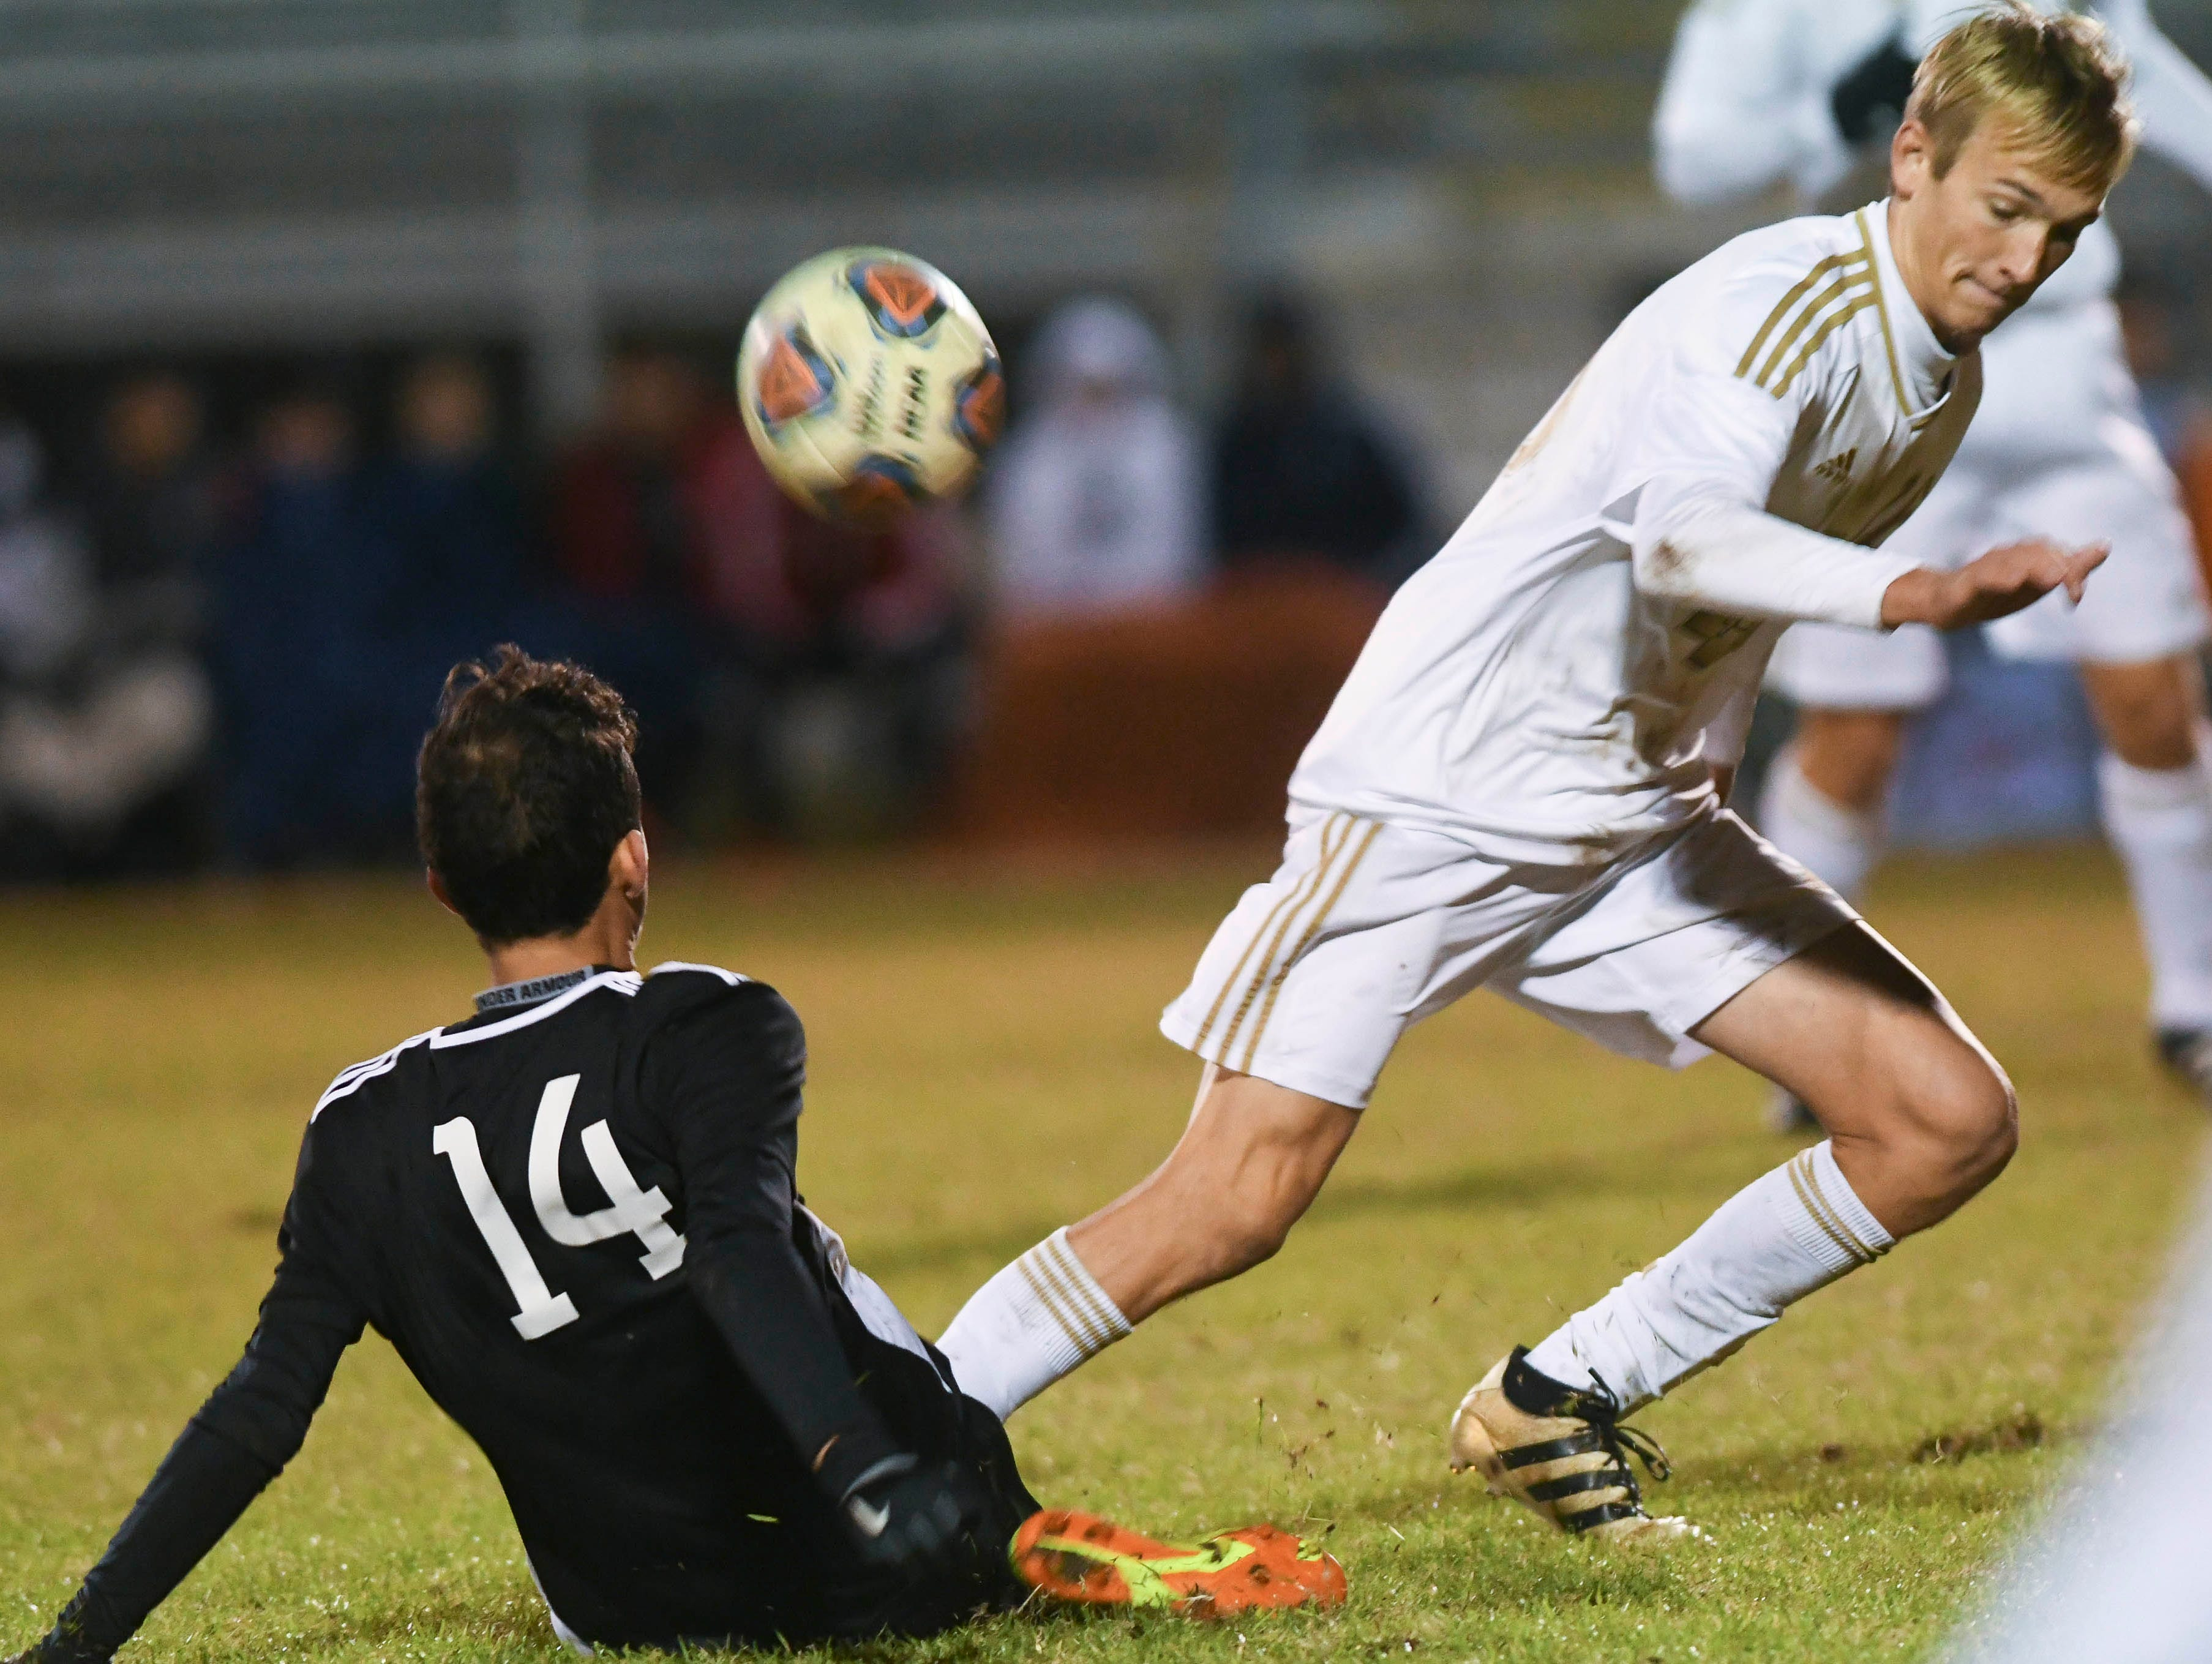 Luis Esteban Son tackles the ball away from Kaleb Bechtol of Merritt Island during Wednesday's District 12, Class 3A semifinal at McLarty Stadium